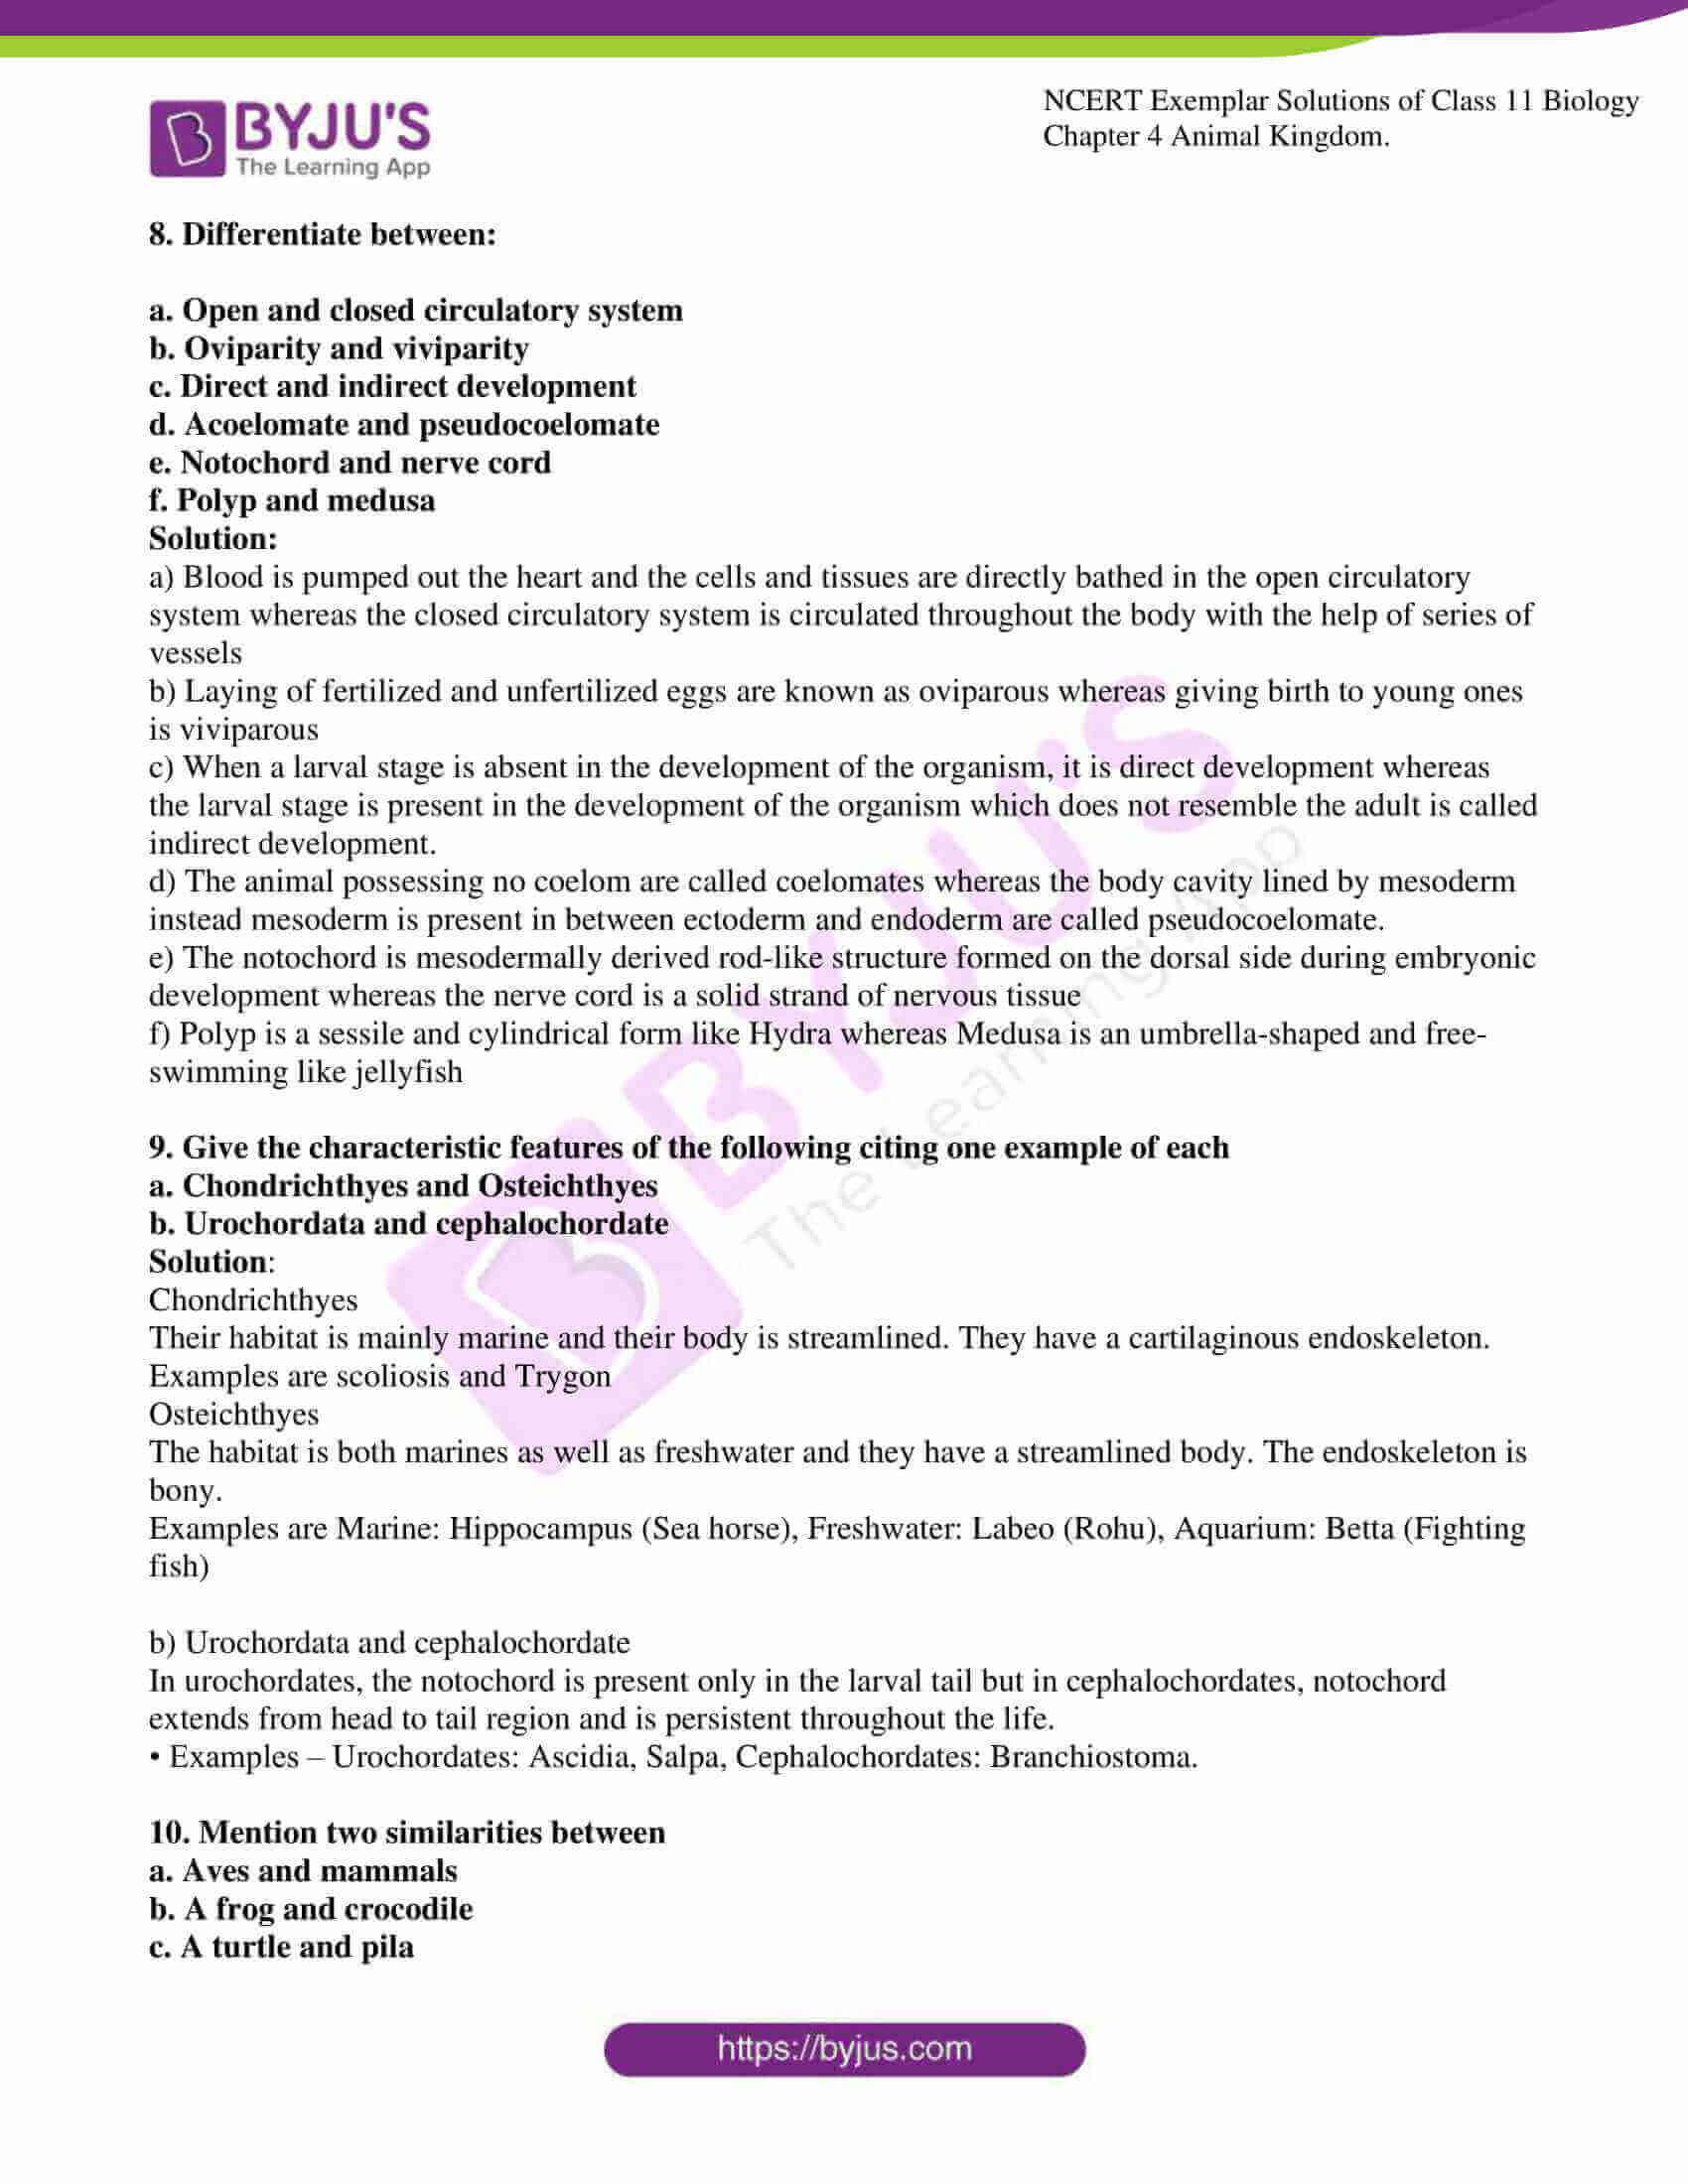 ncert exemplar solutions for class 11 bio chapter 4 08